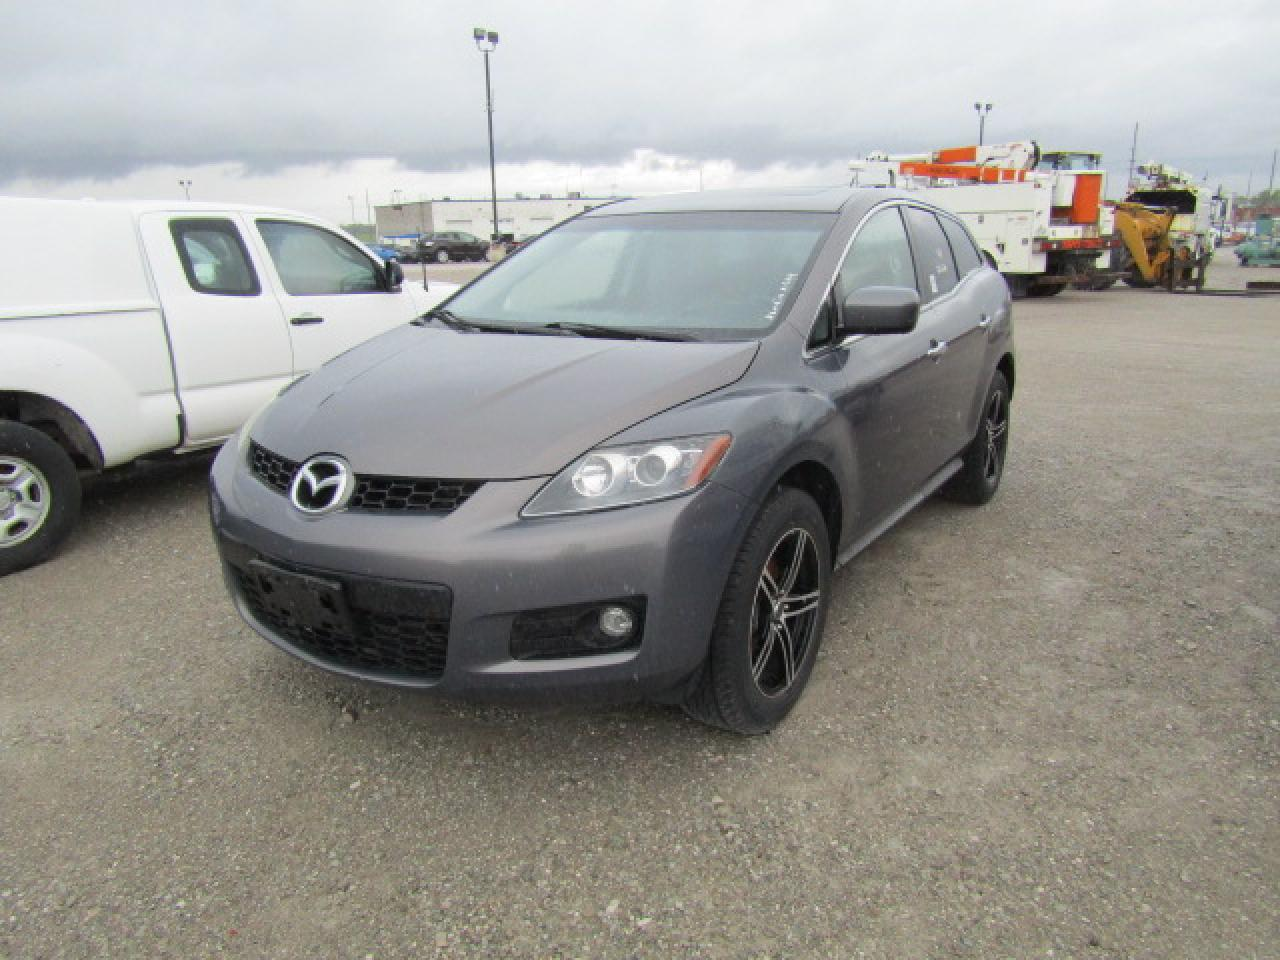 Photo of Grey 2007 Mazda CX-7